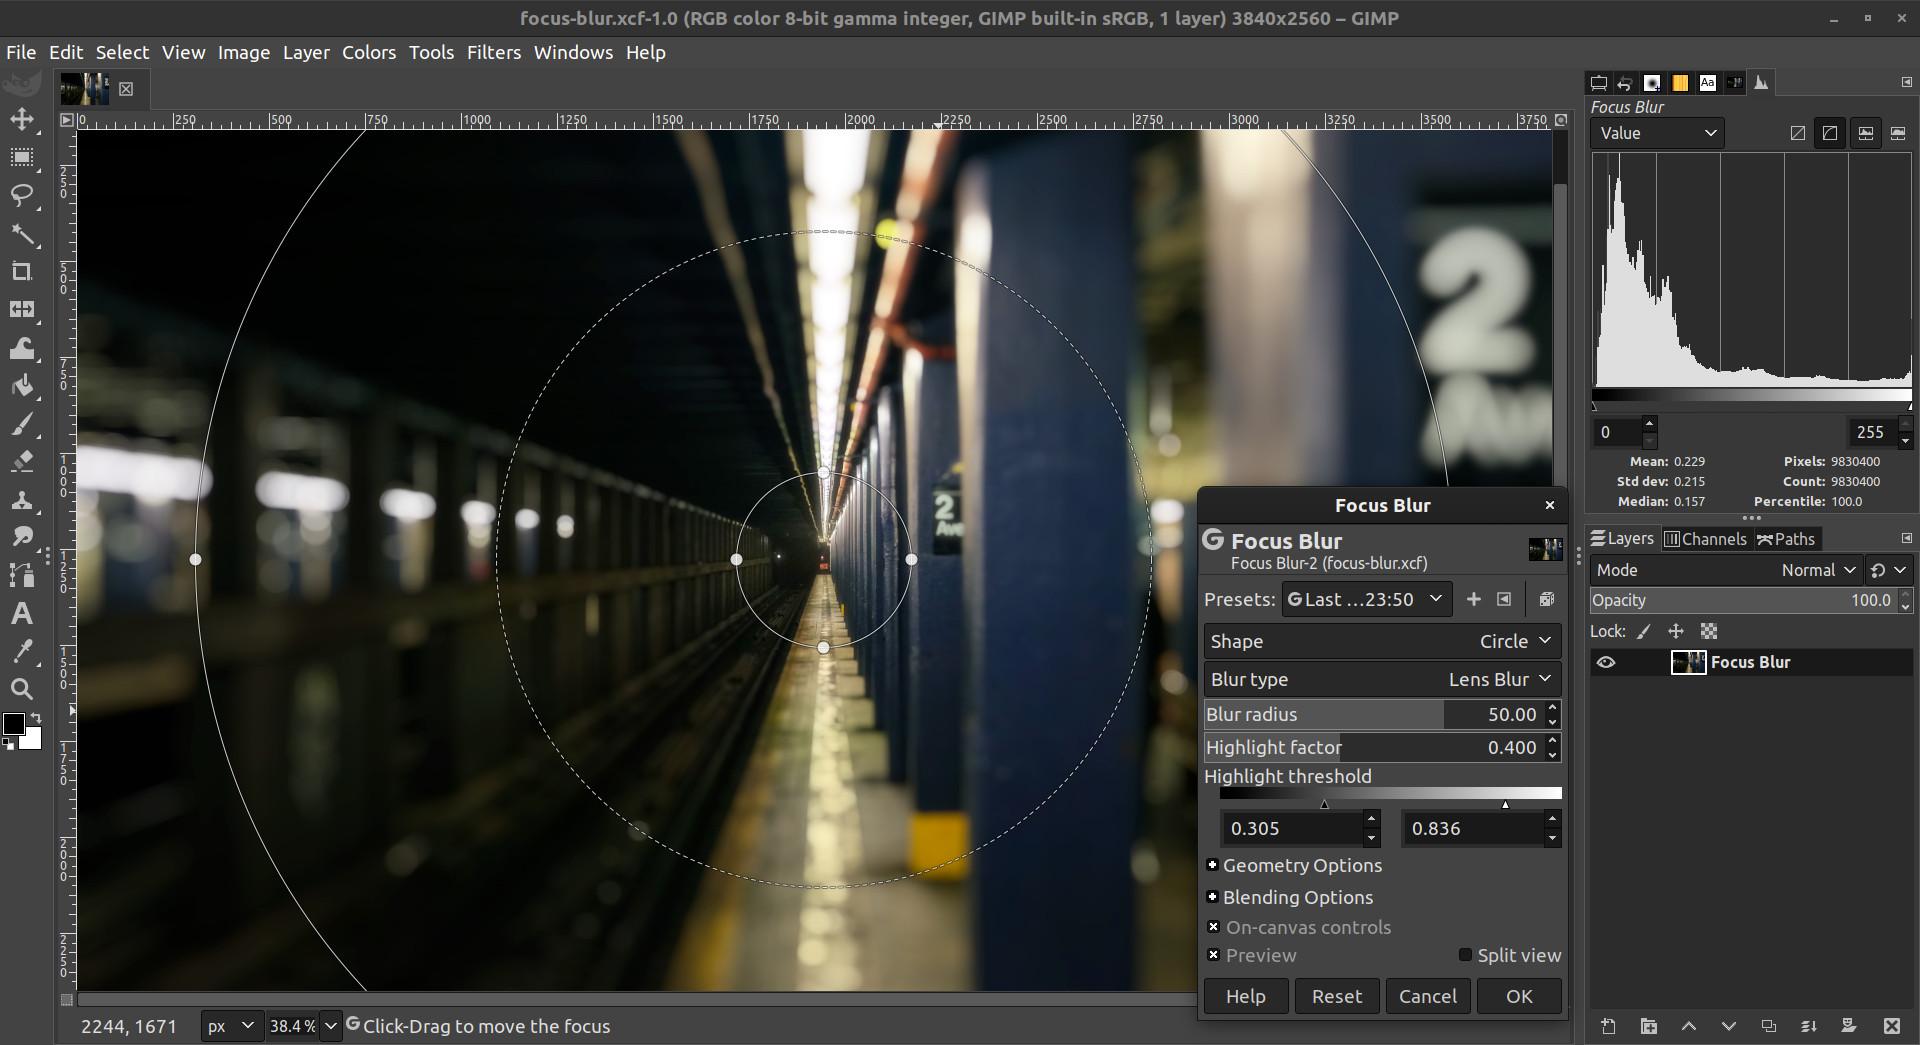 Focus Blur filter